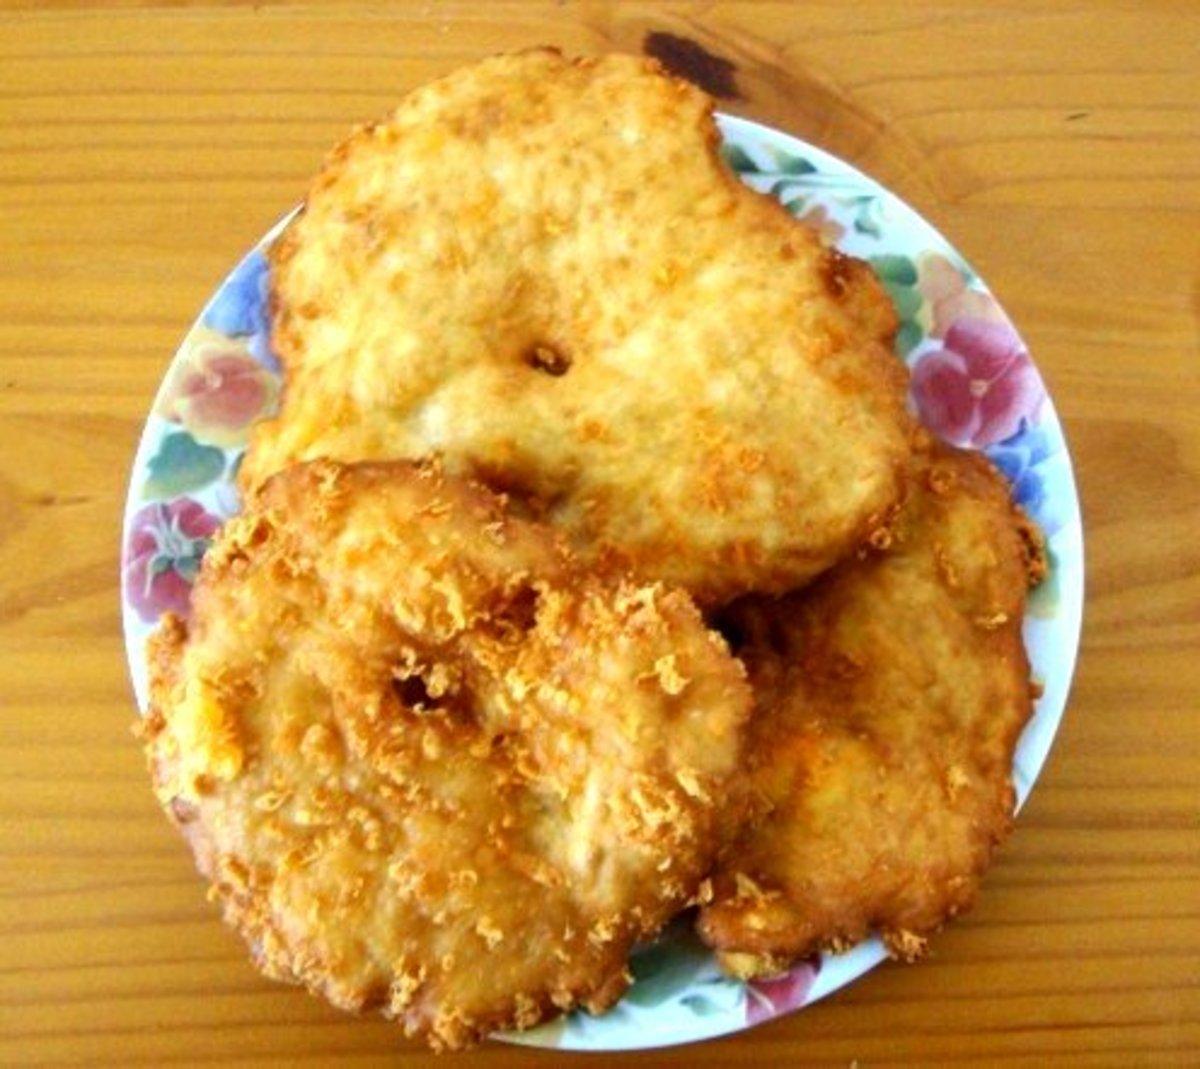 Fried crispy and golden.